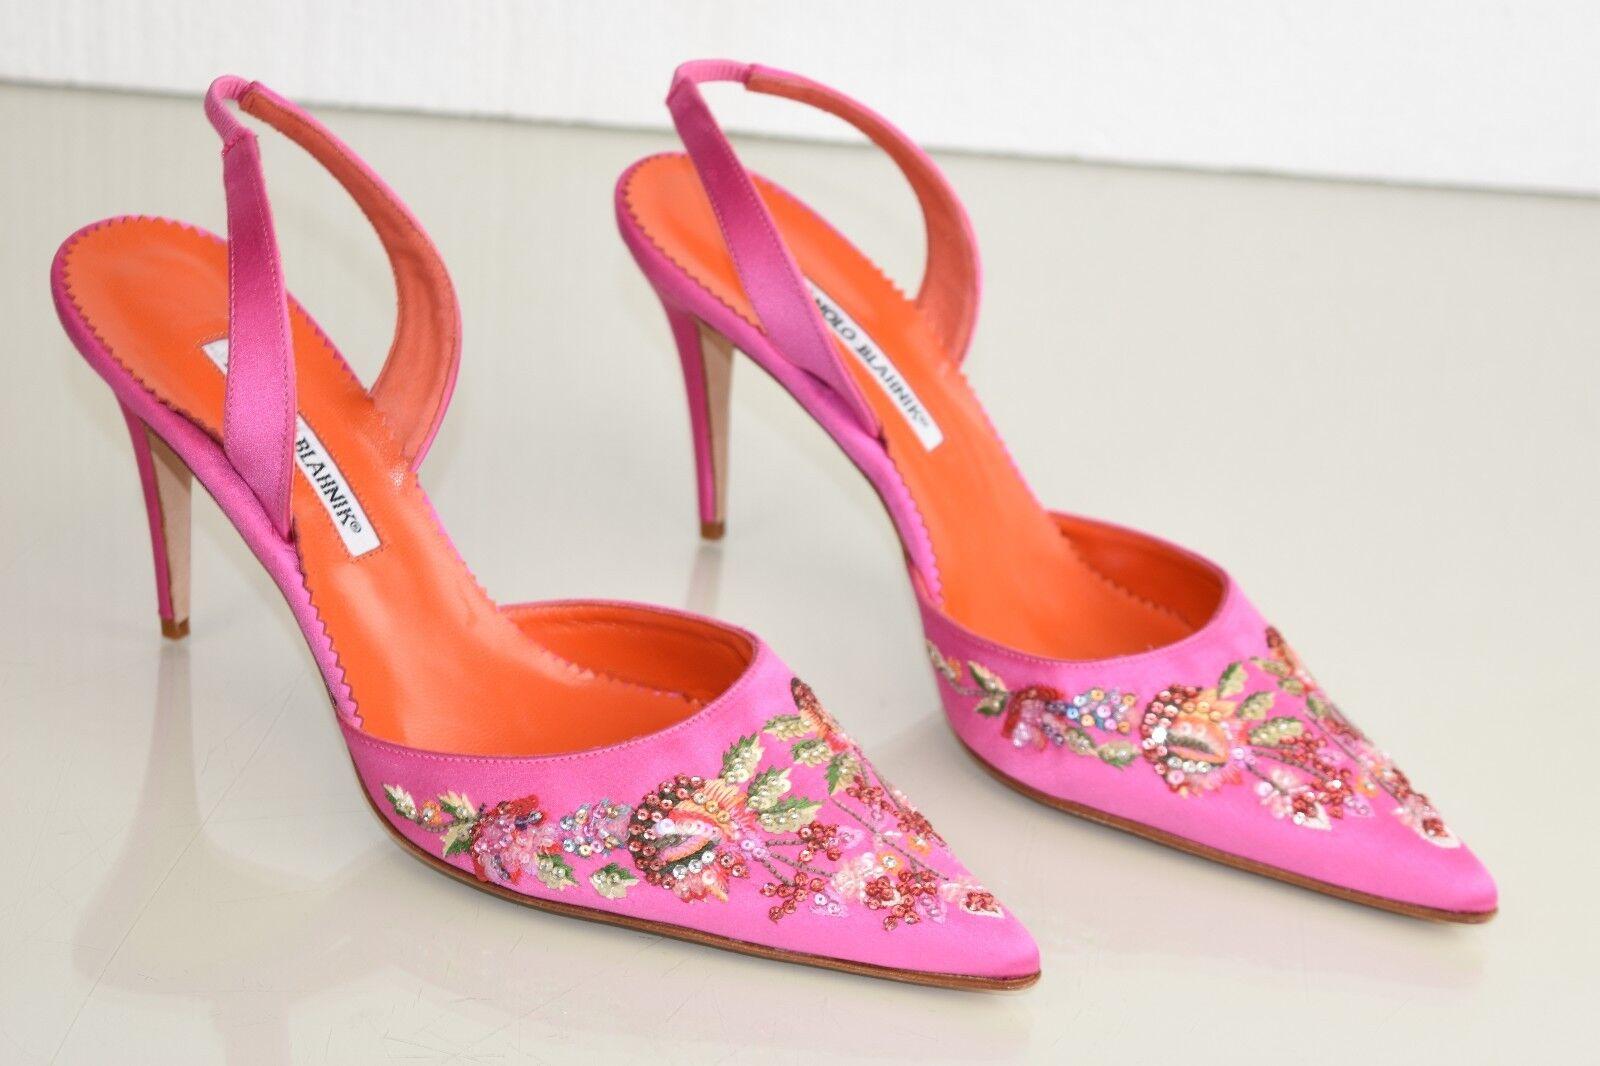 NEW Manolo Blahnik HAYIR Carolyne Pumps Pink Satin Sequins heels Shoes 40 41